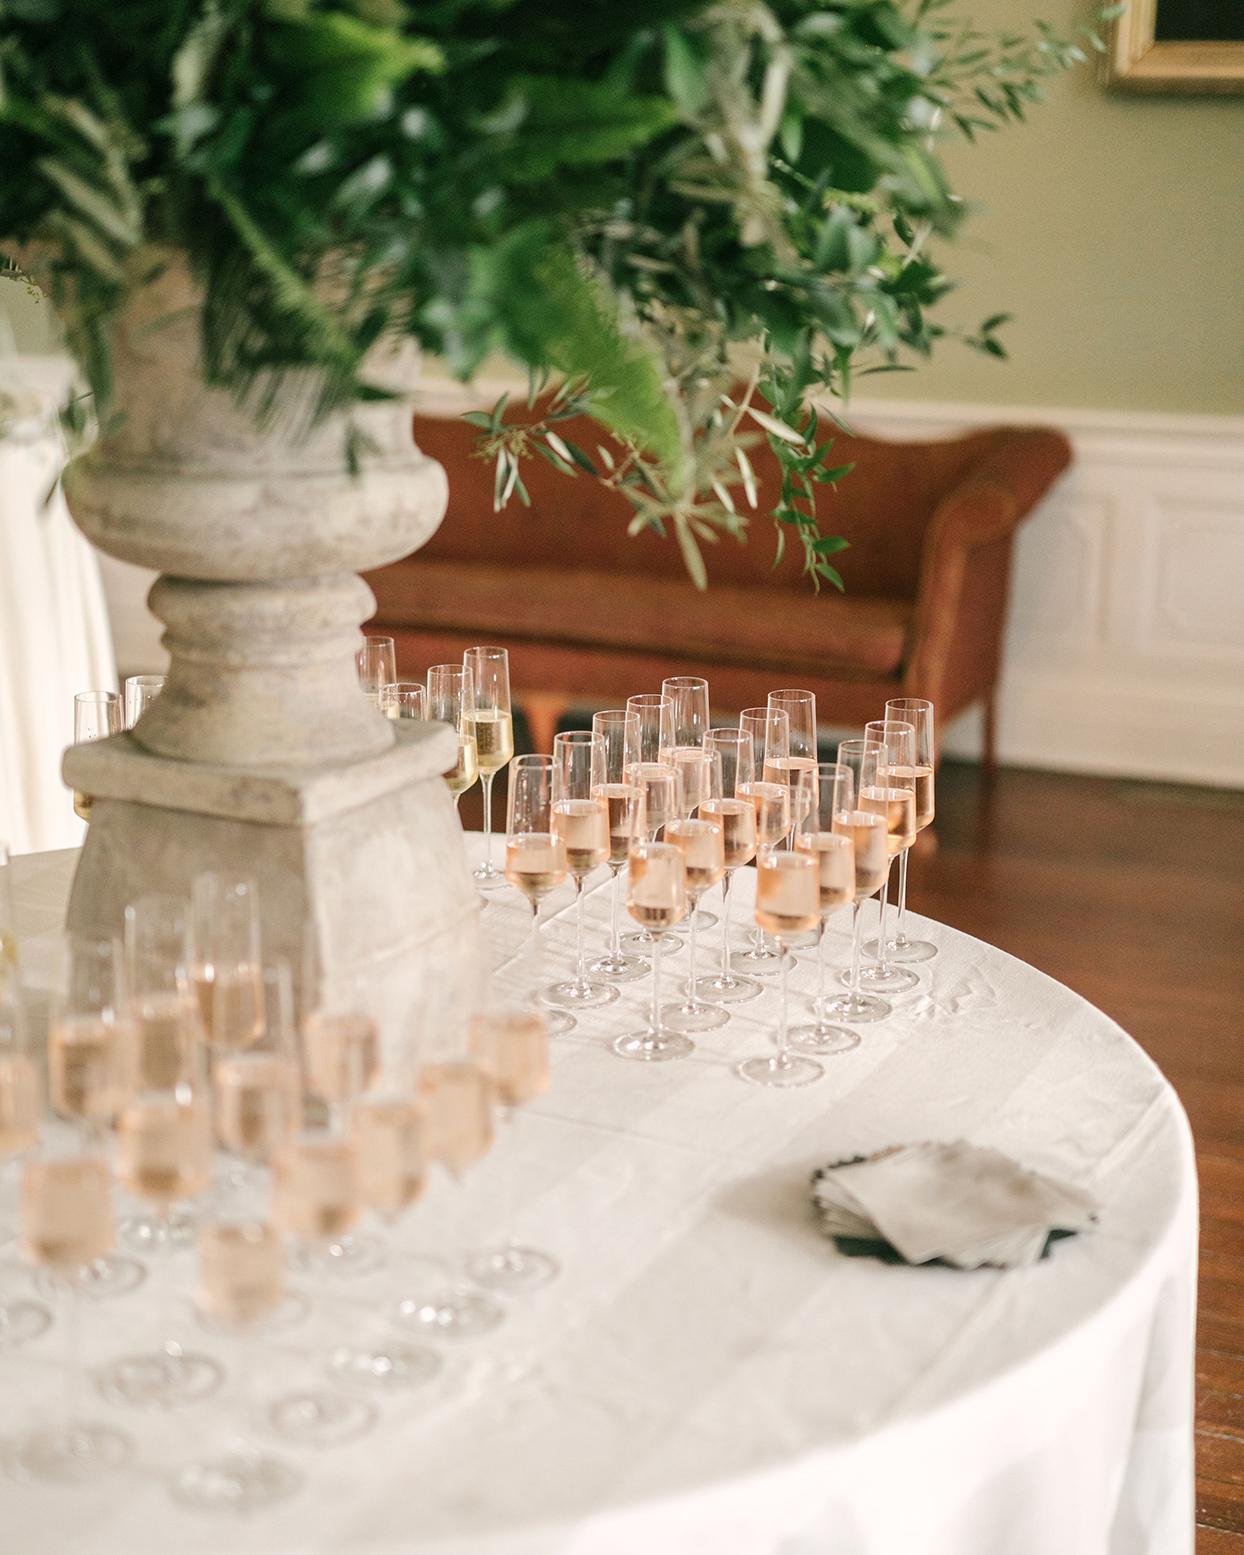 beverly steve wedding champagne on white table